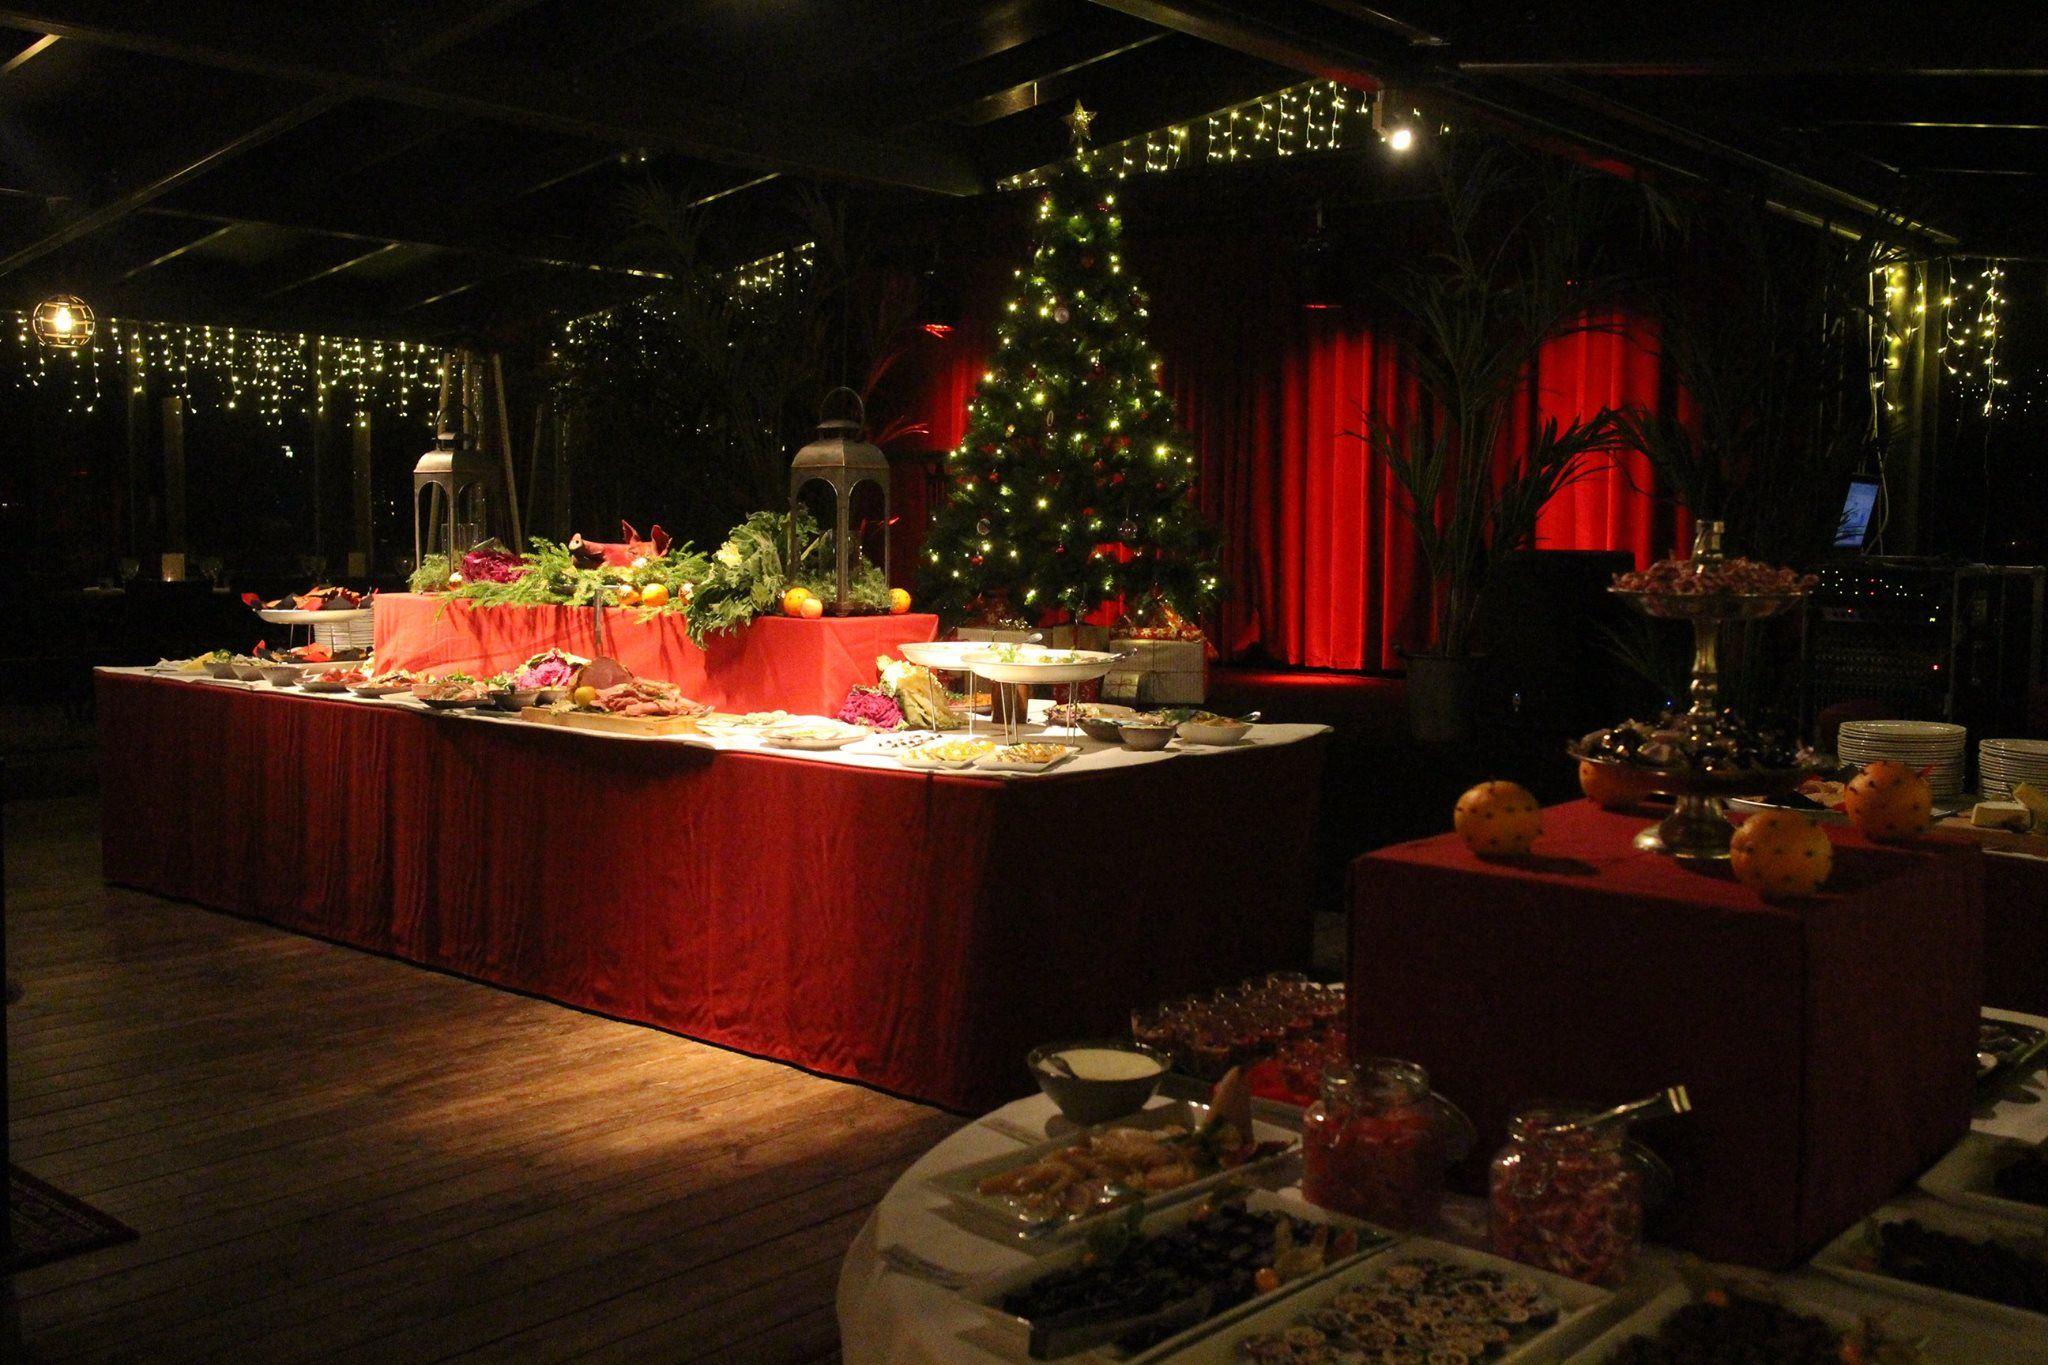 Christmas buffet at restaurant Brasserie